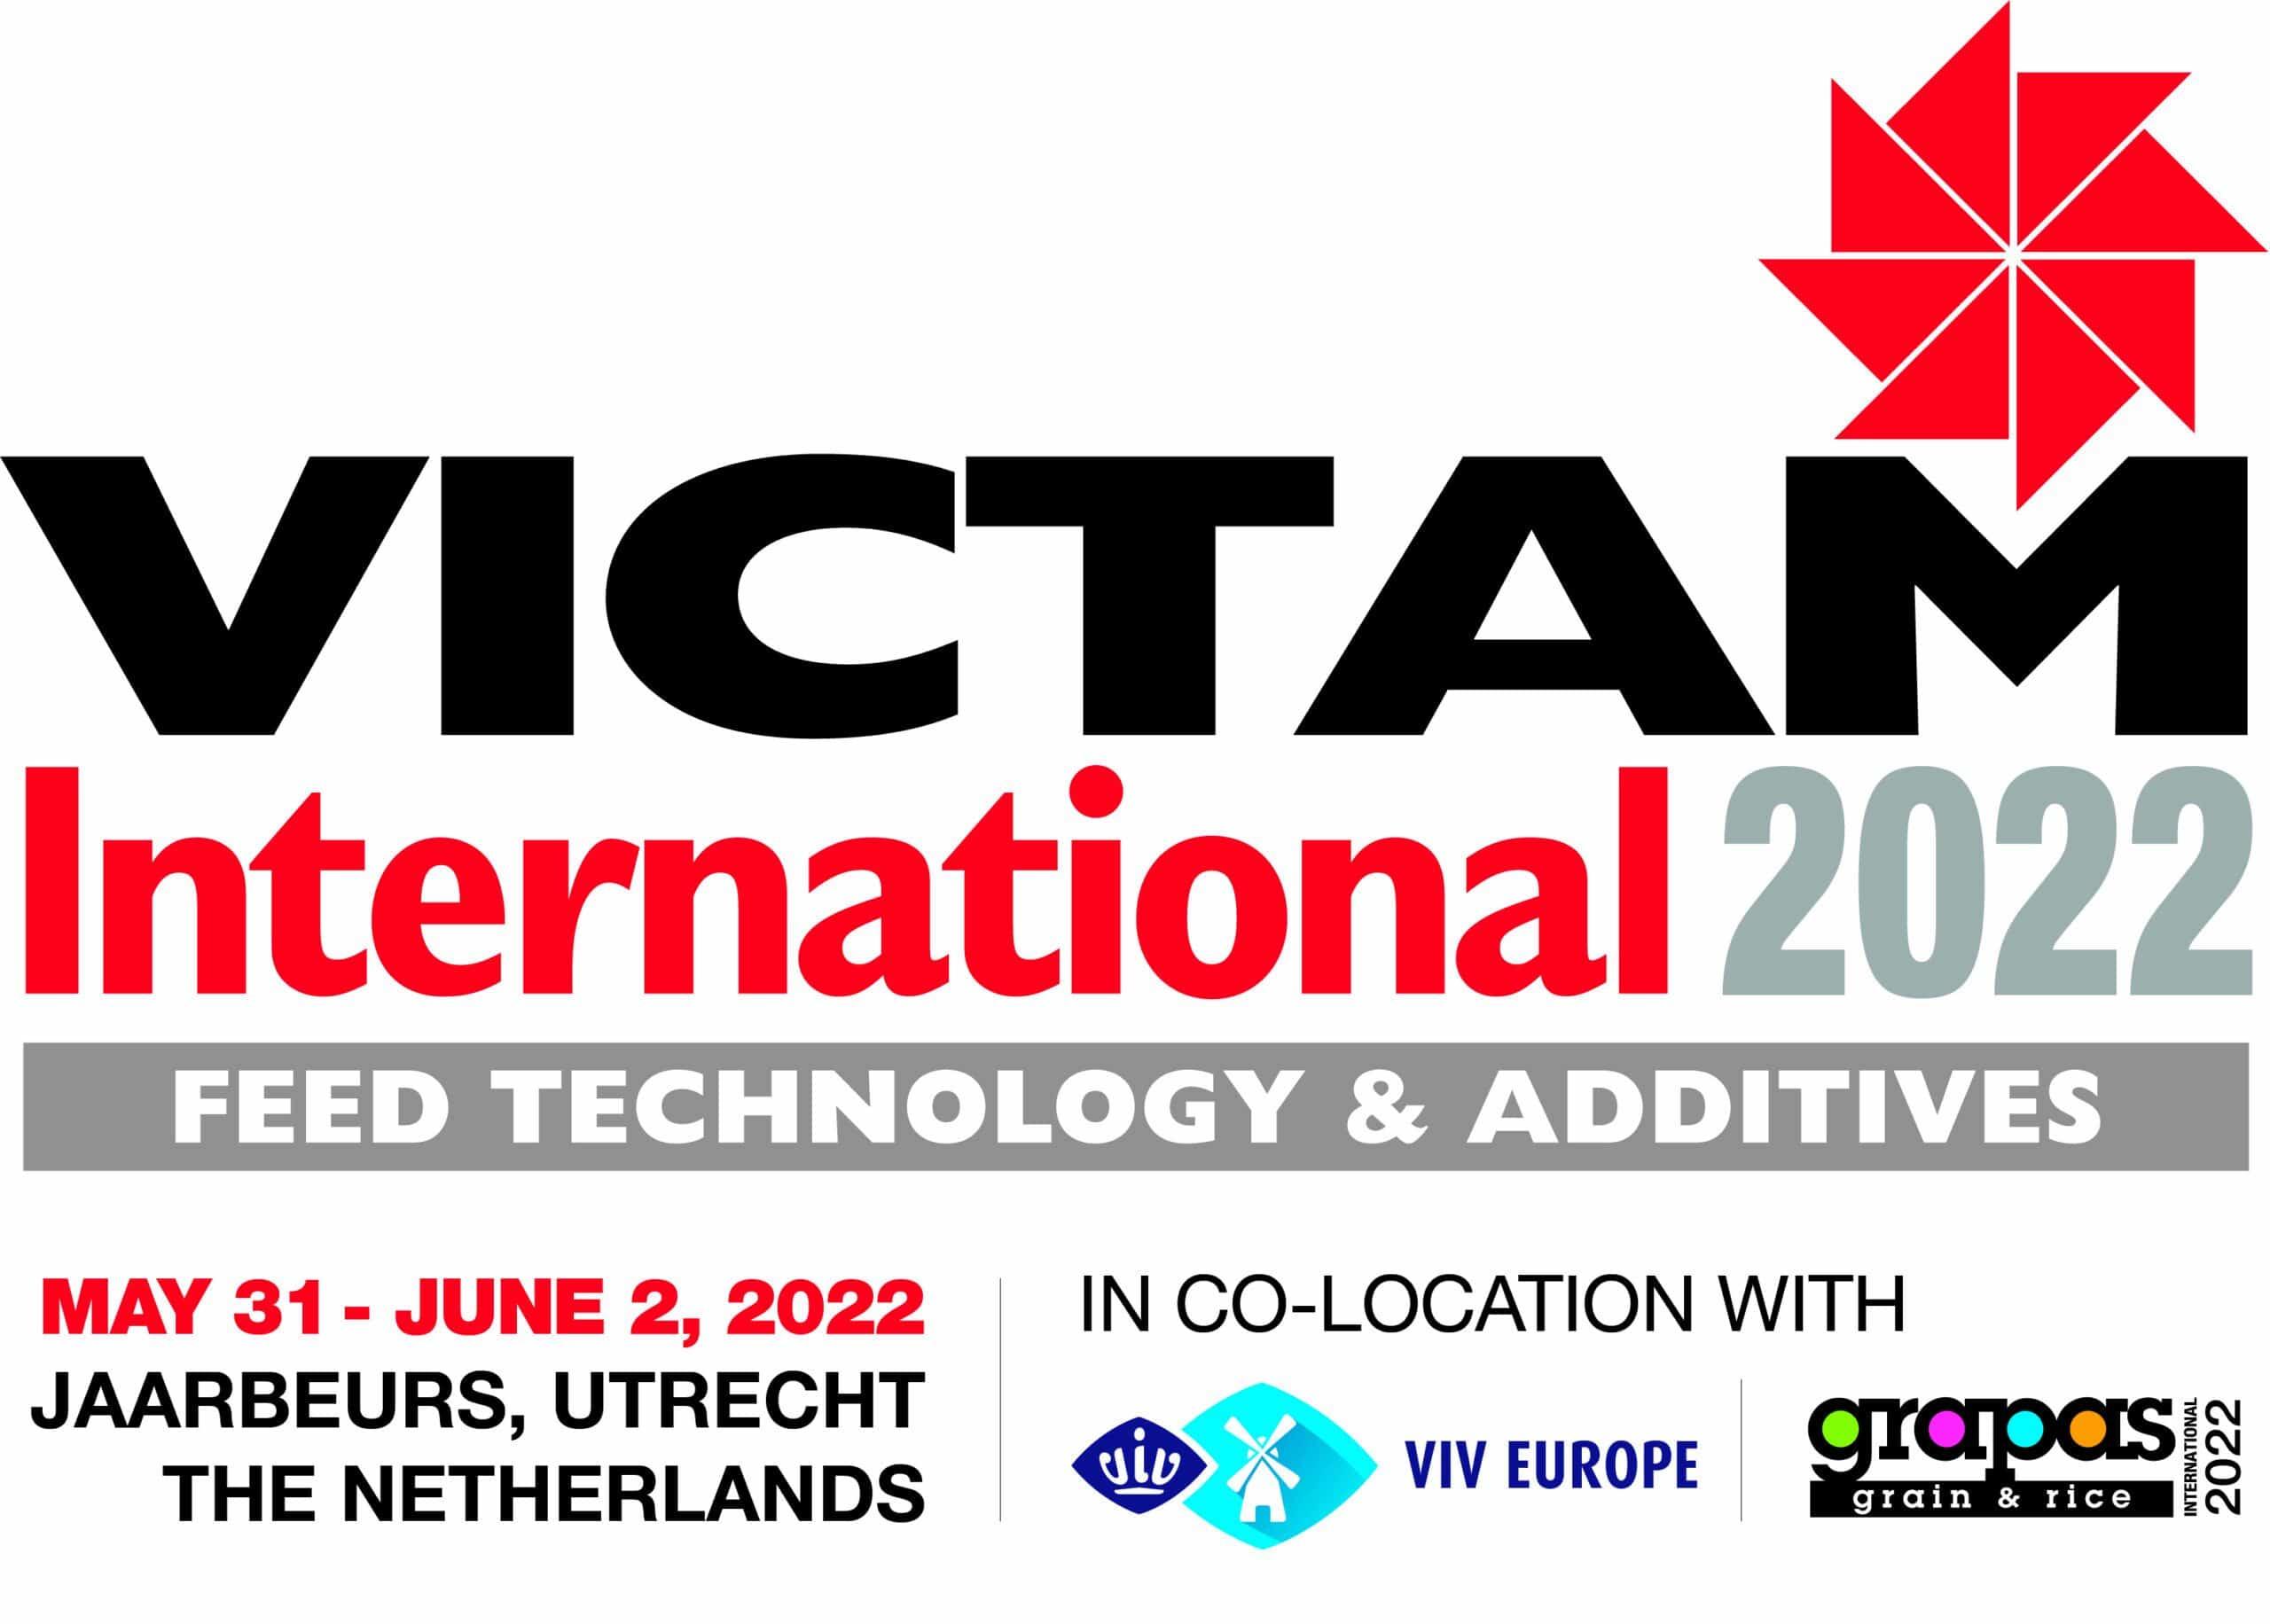 VICTAM International 2022